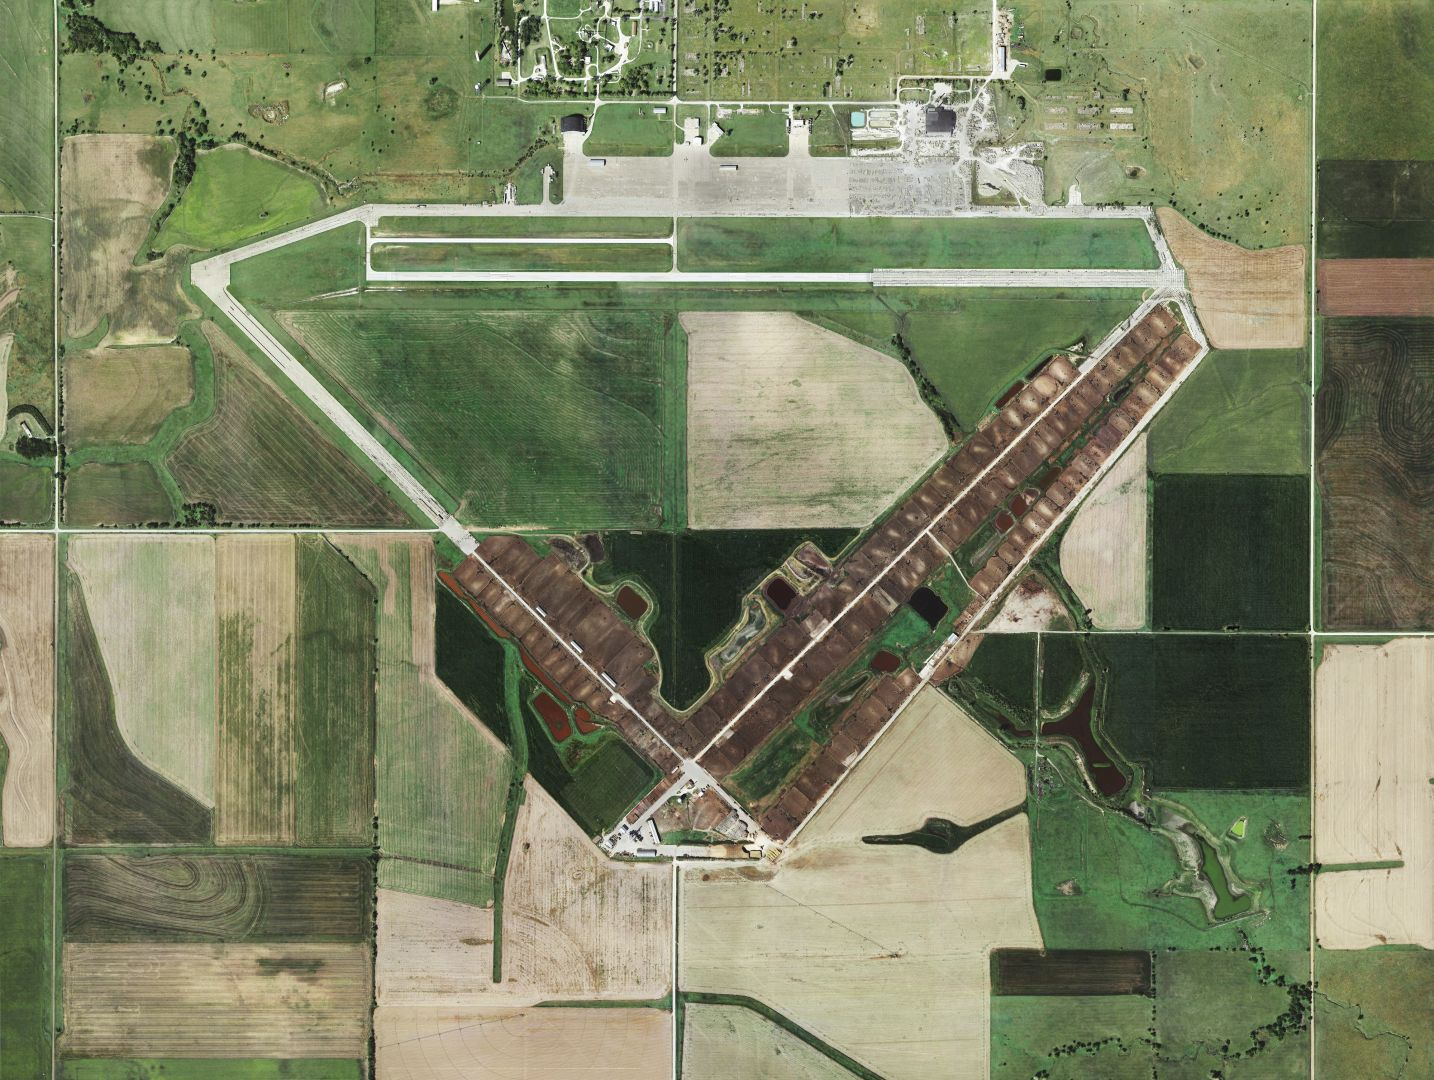 Mishka Henner, Feedlots, Black Diamond Feeders, Herington Air Base, Kansas2013 © Mishka Henner. Courtesy of the artist and Galleria Bianconi, Milano